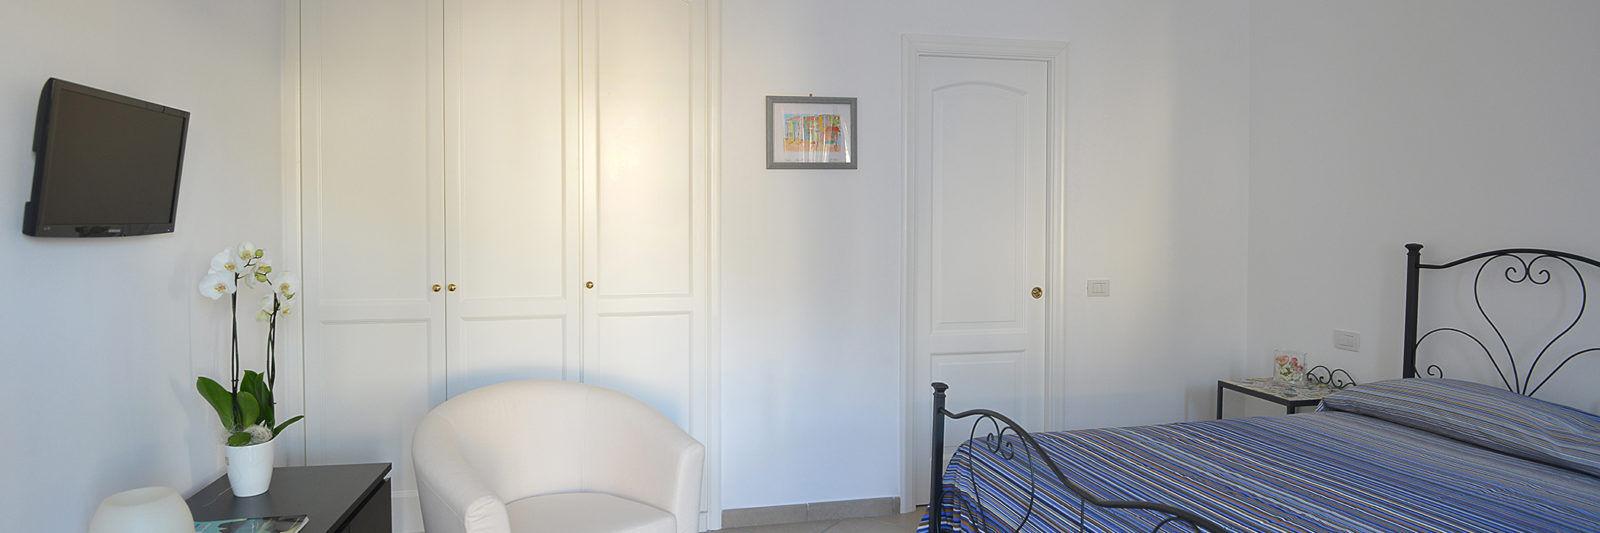 Camera Matrimoniale Ortensia